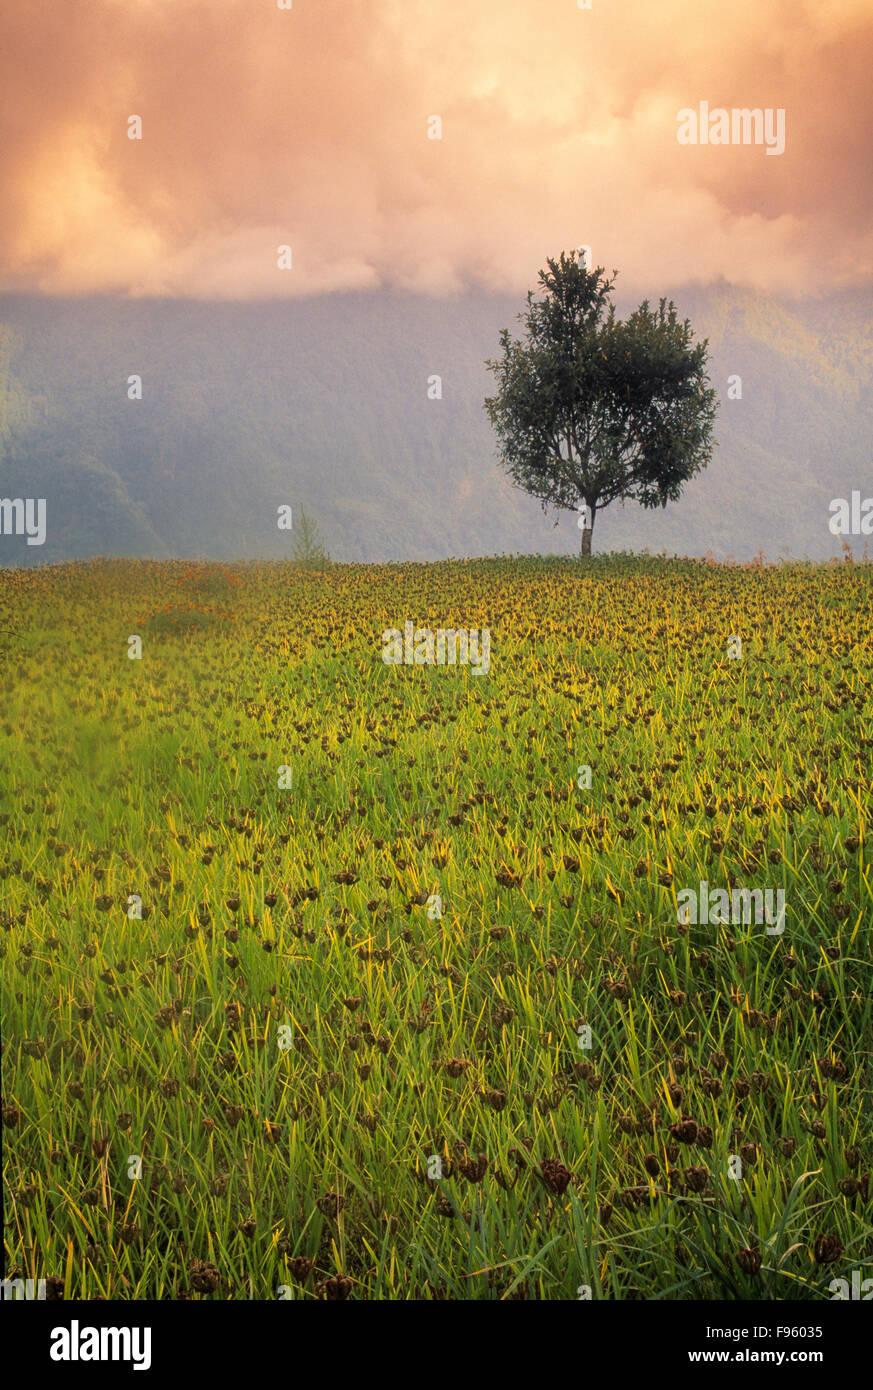 Cropland on the Annapurna Circuit, Nepal - Stock Image